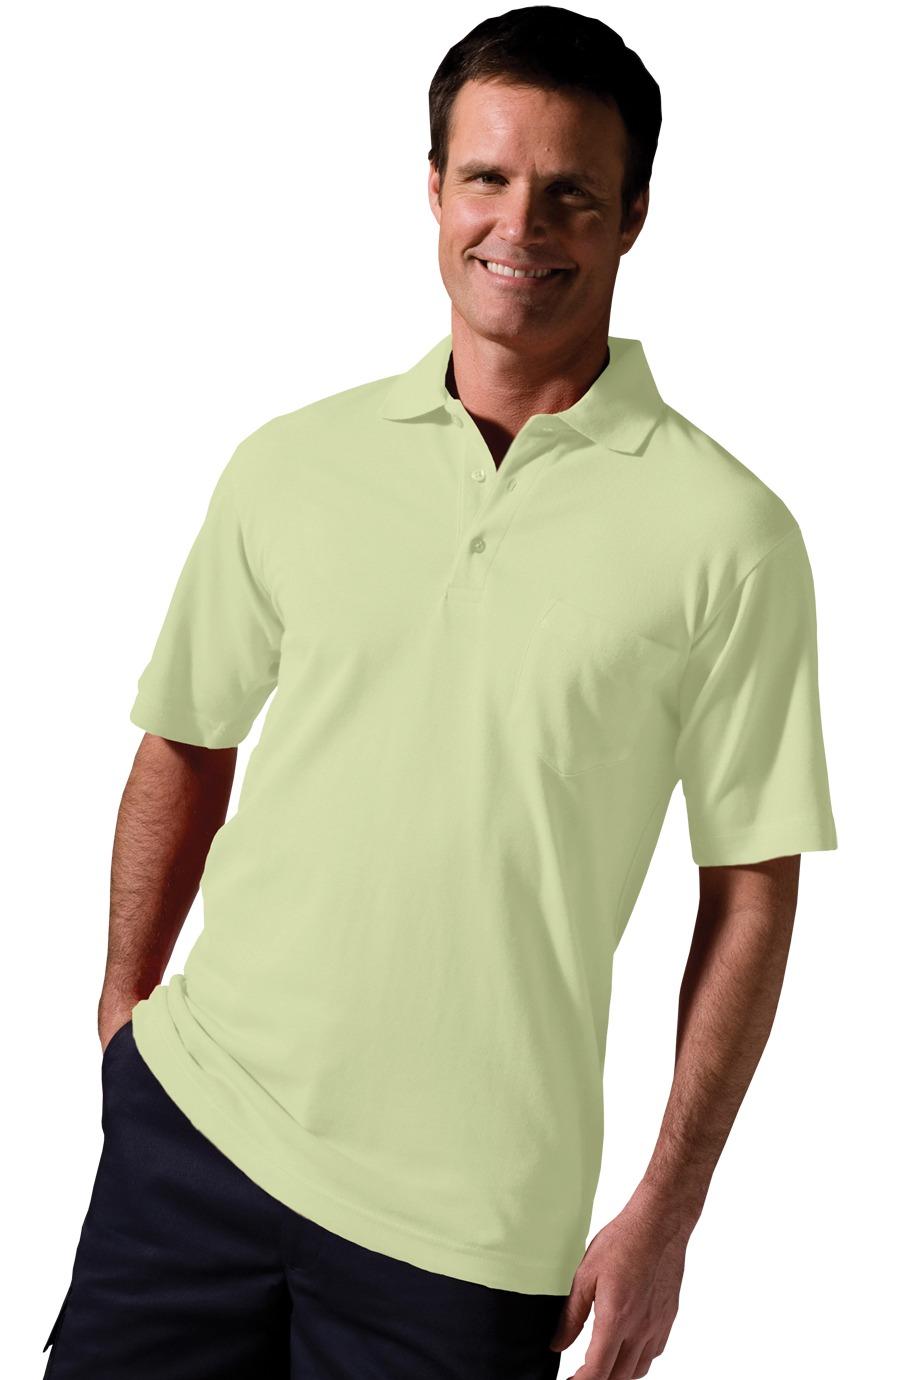 Edwards Garment 1535 - Soft Touch Short Sleeve All Cotton Pckt Pique Polo